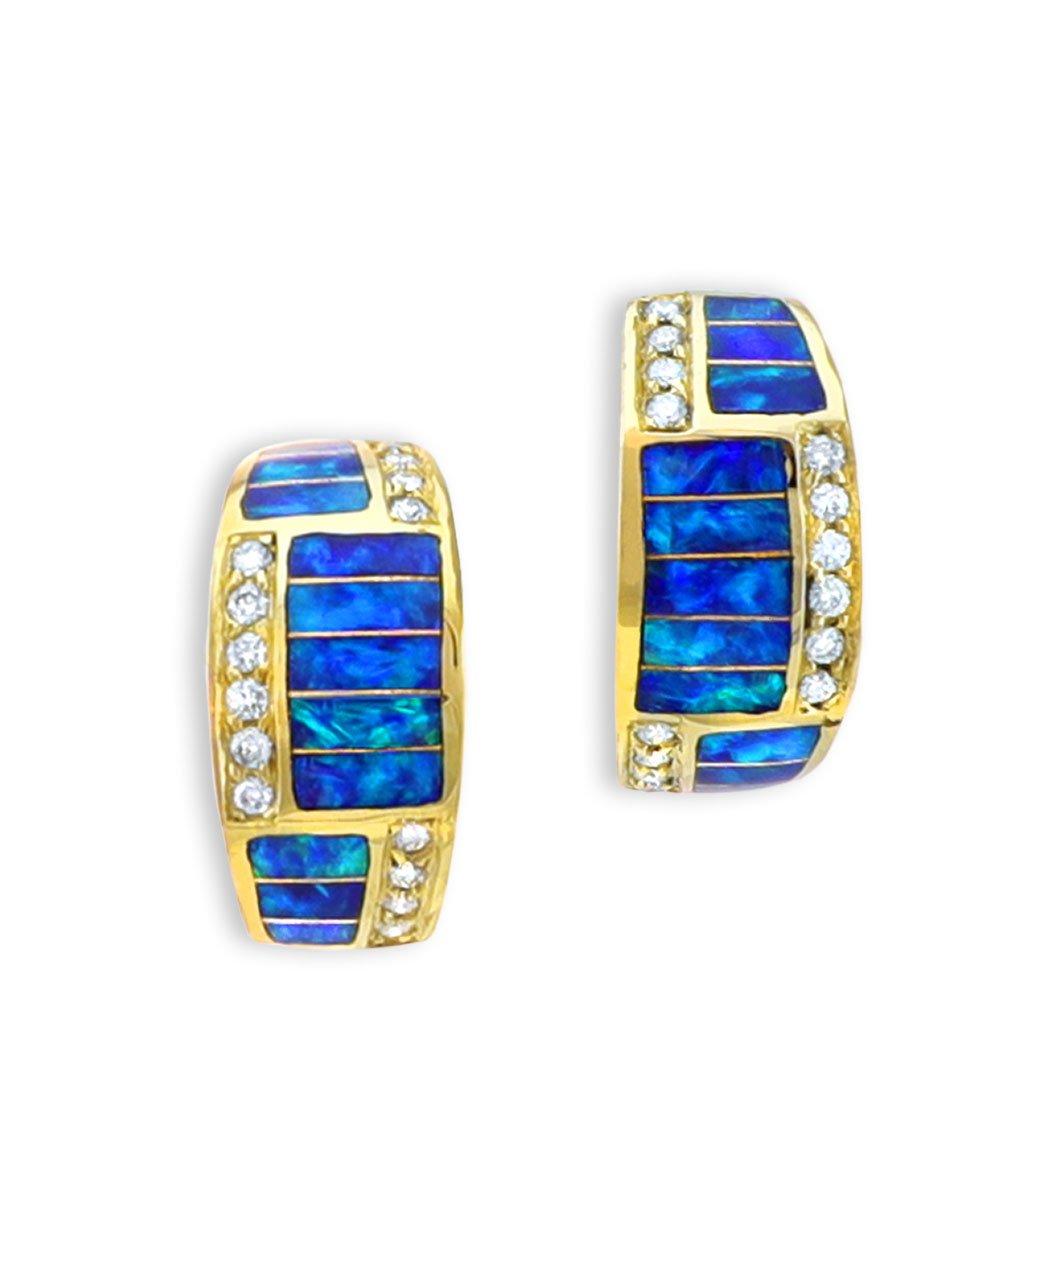 Maverick's 14K Gold Opal Inlay Earrings With Diamonds